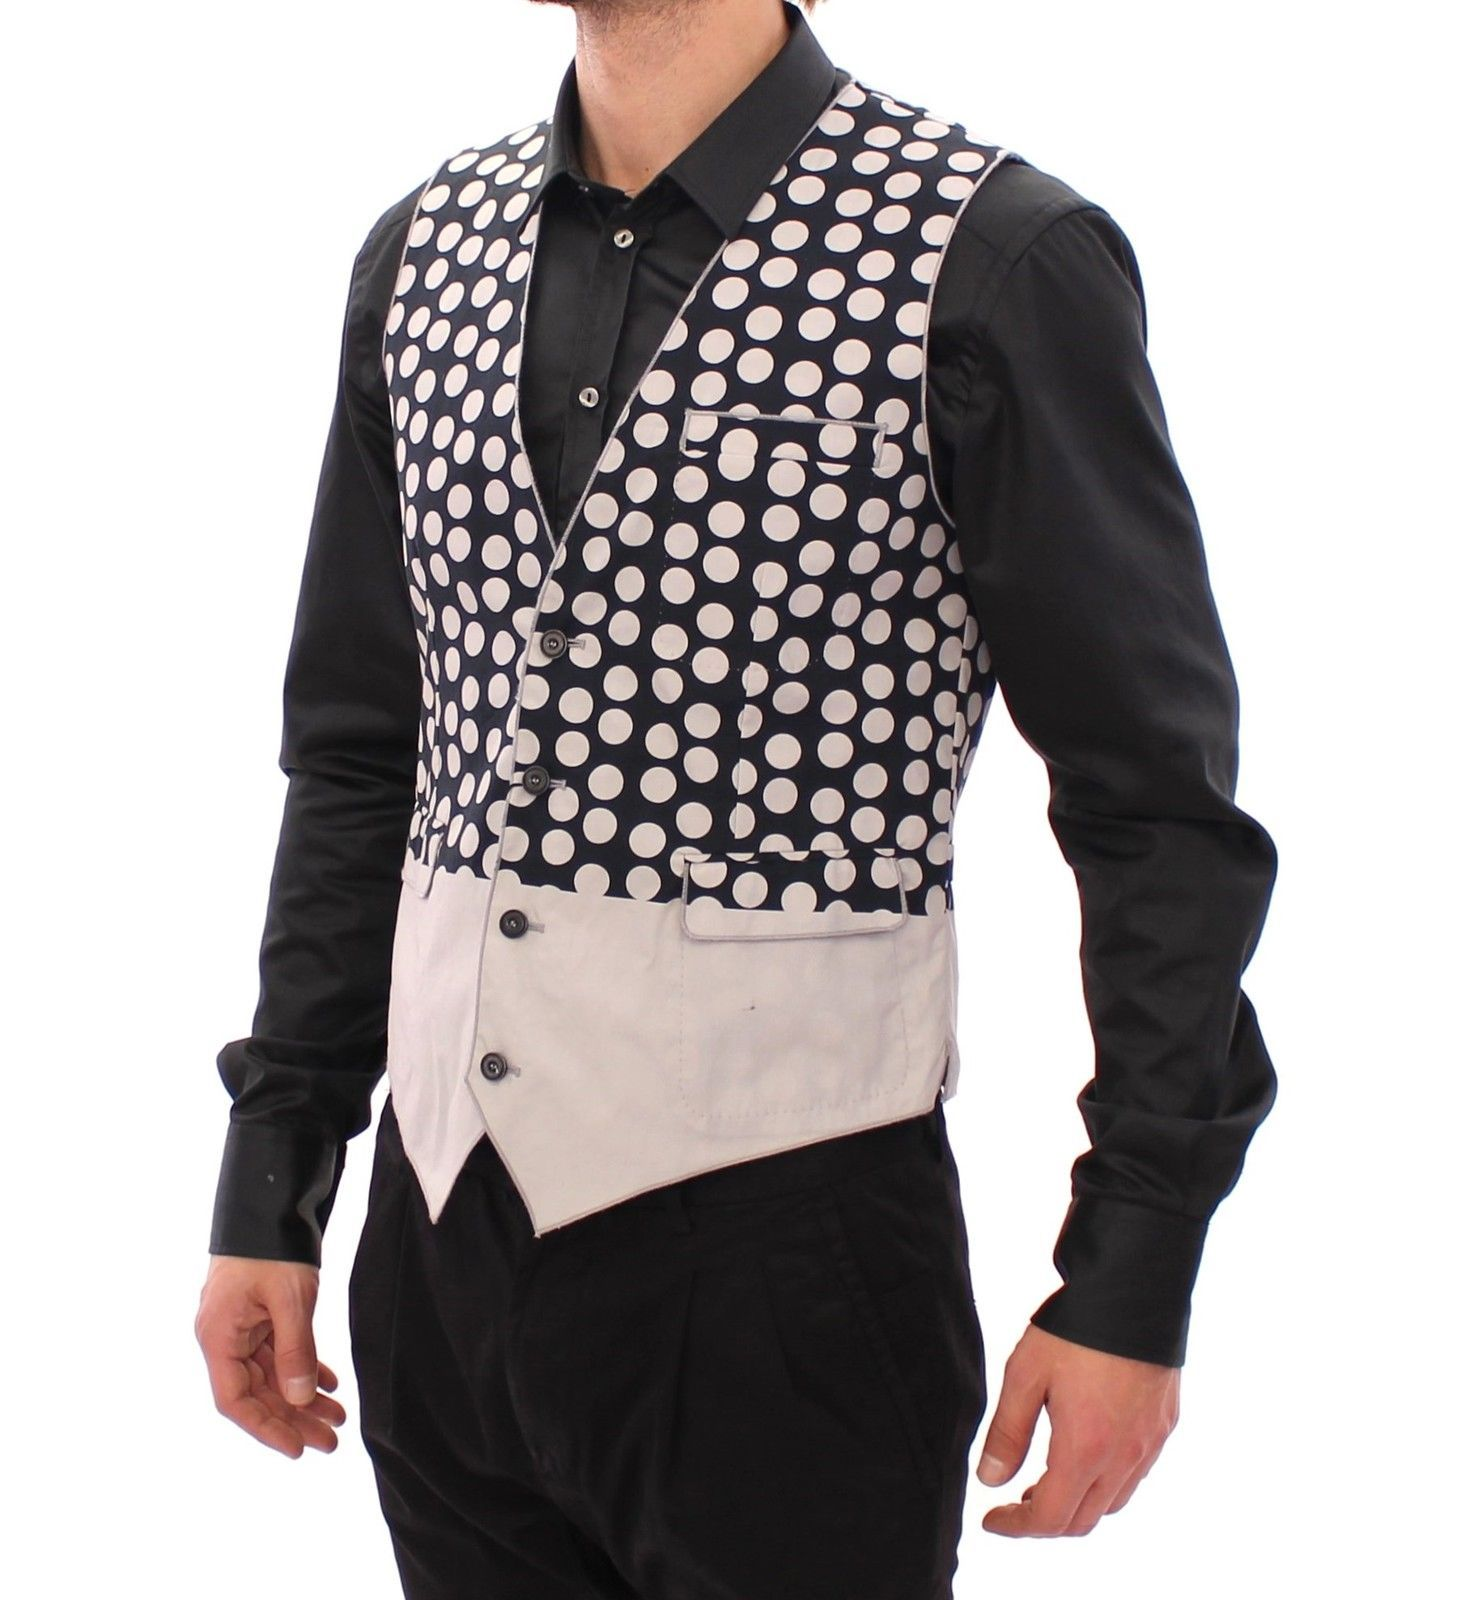 Dolce & Gabbana Blue Polka Dot Dress Vest Gilet Weste